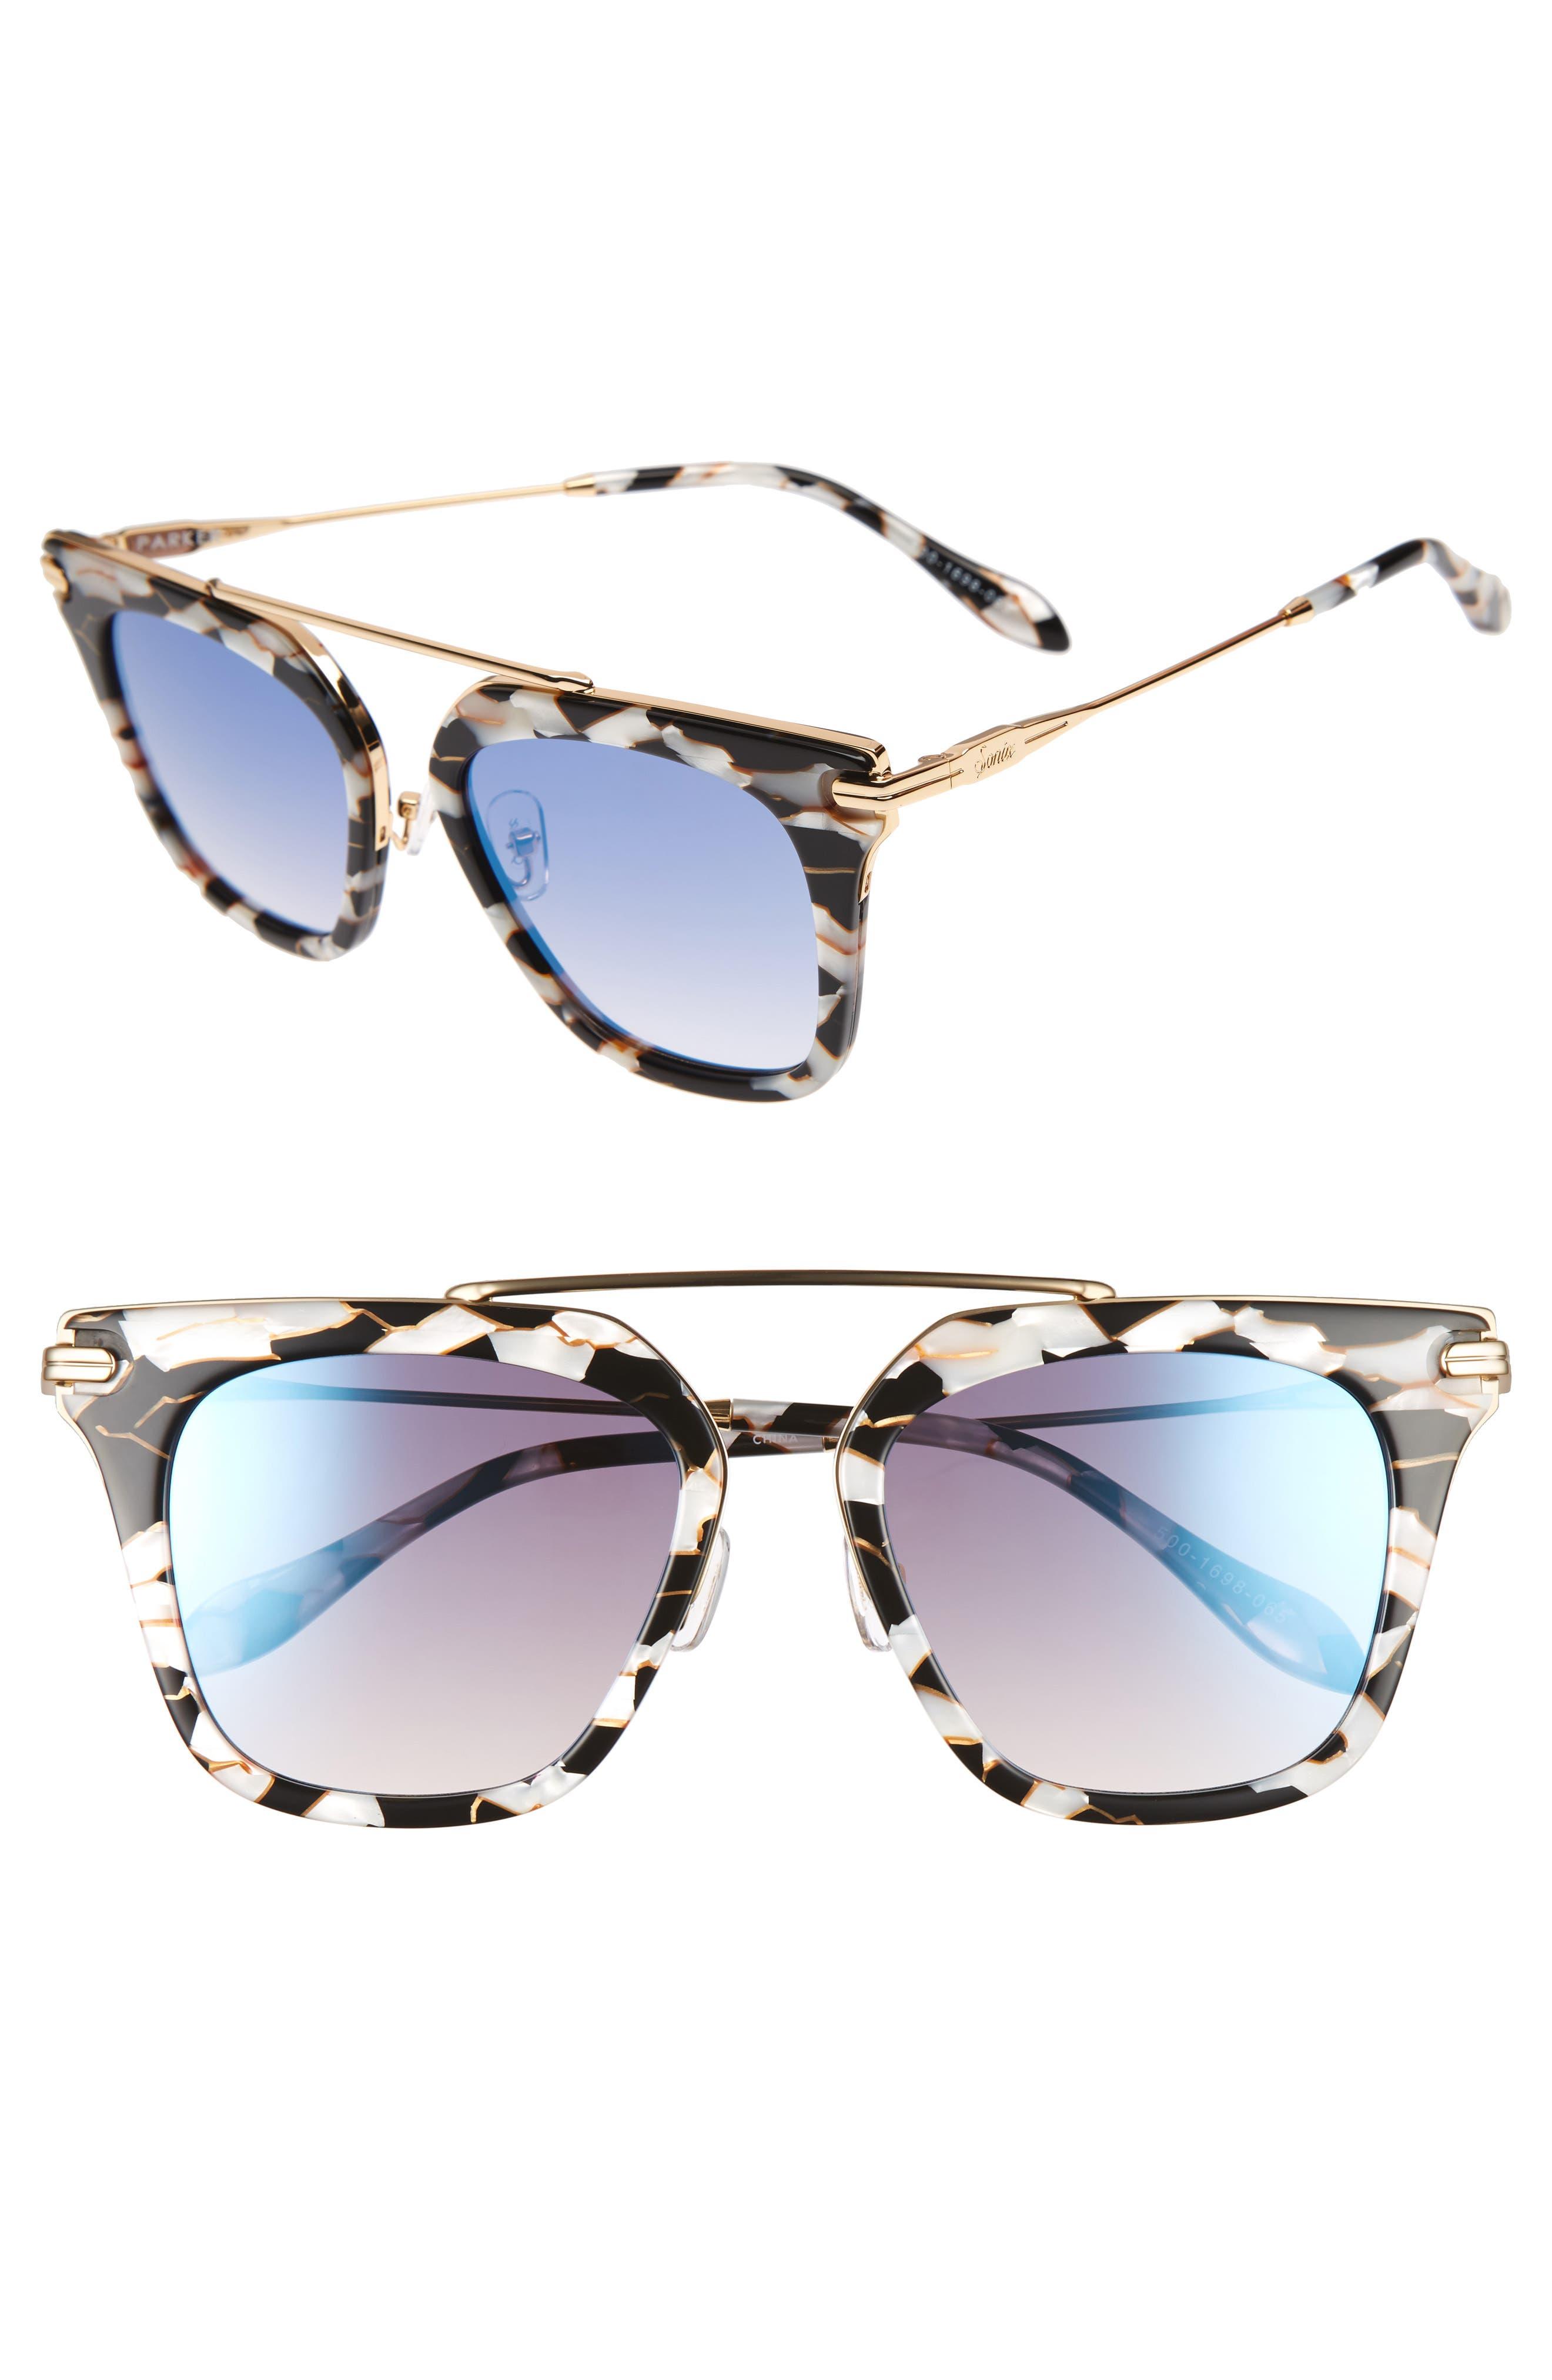 Parker 55mm Sunglasses,                             Main thumbnail 1, color,                             Luxe Marble/ Indigo Mirror